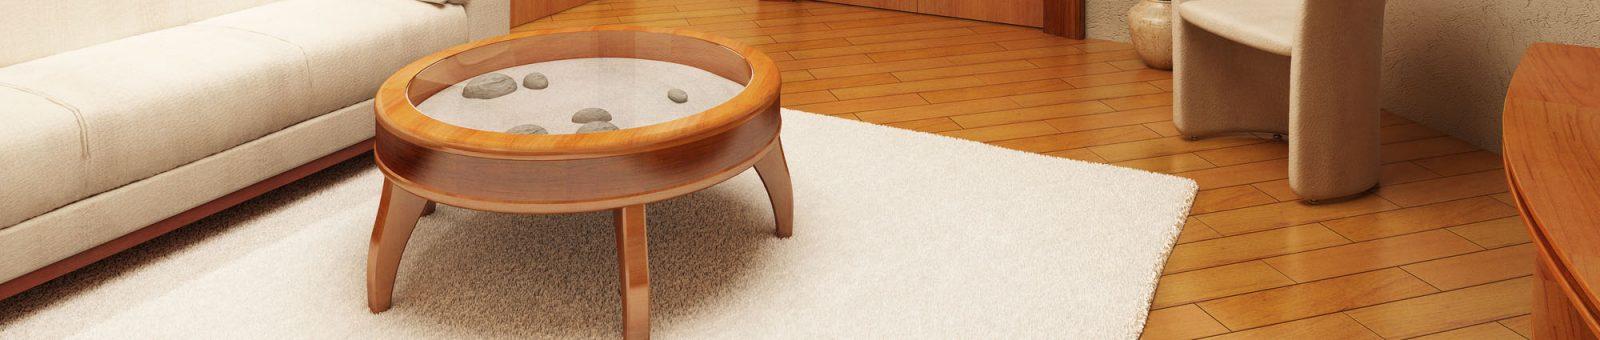 Hardwood Laminate Flooring Gel Gloss Rv